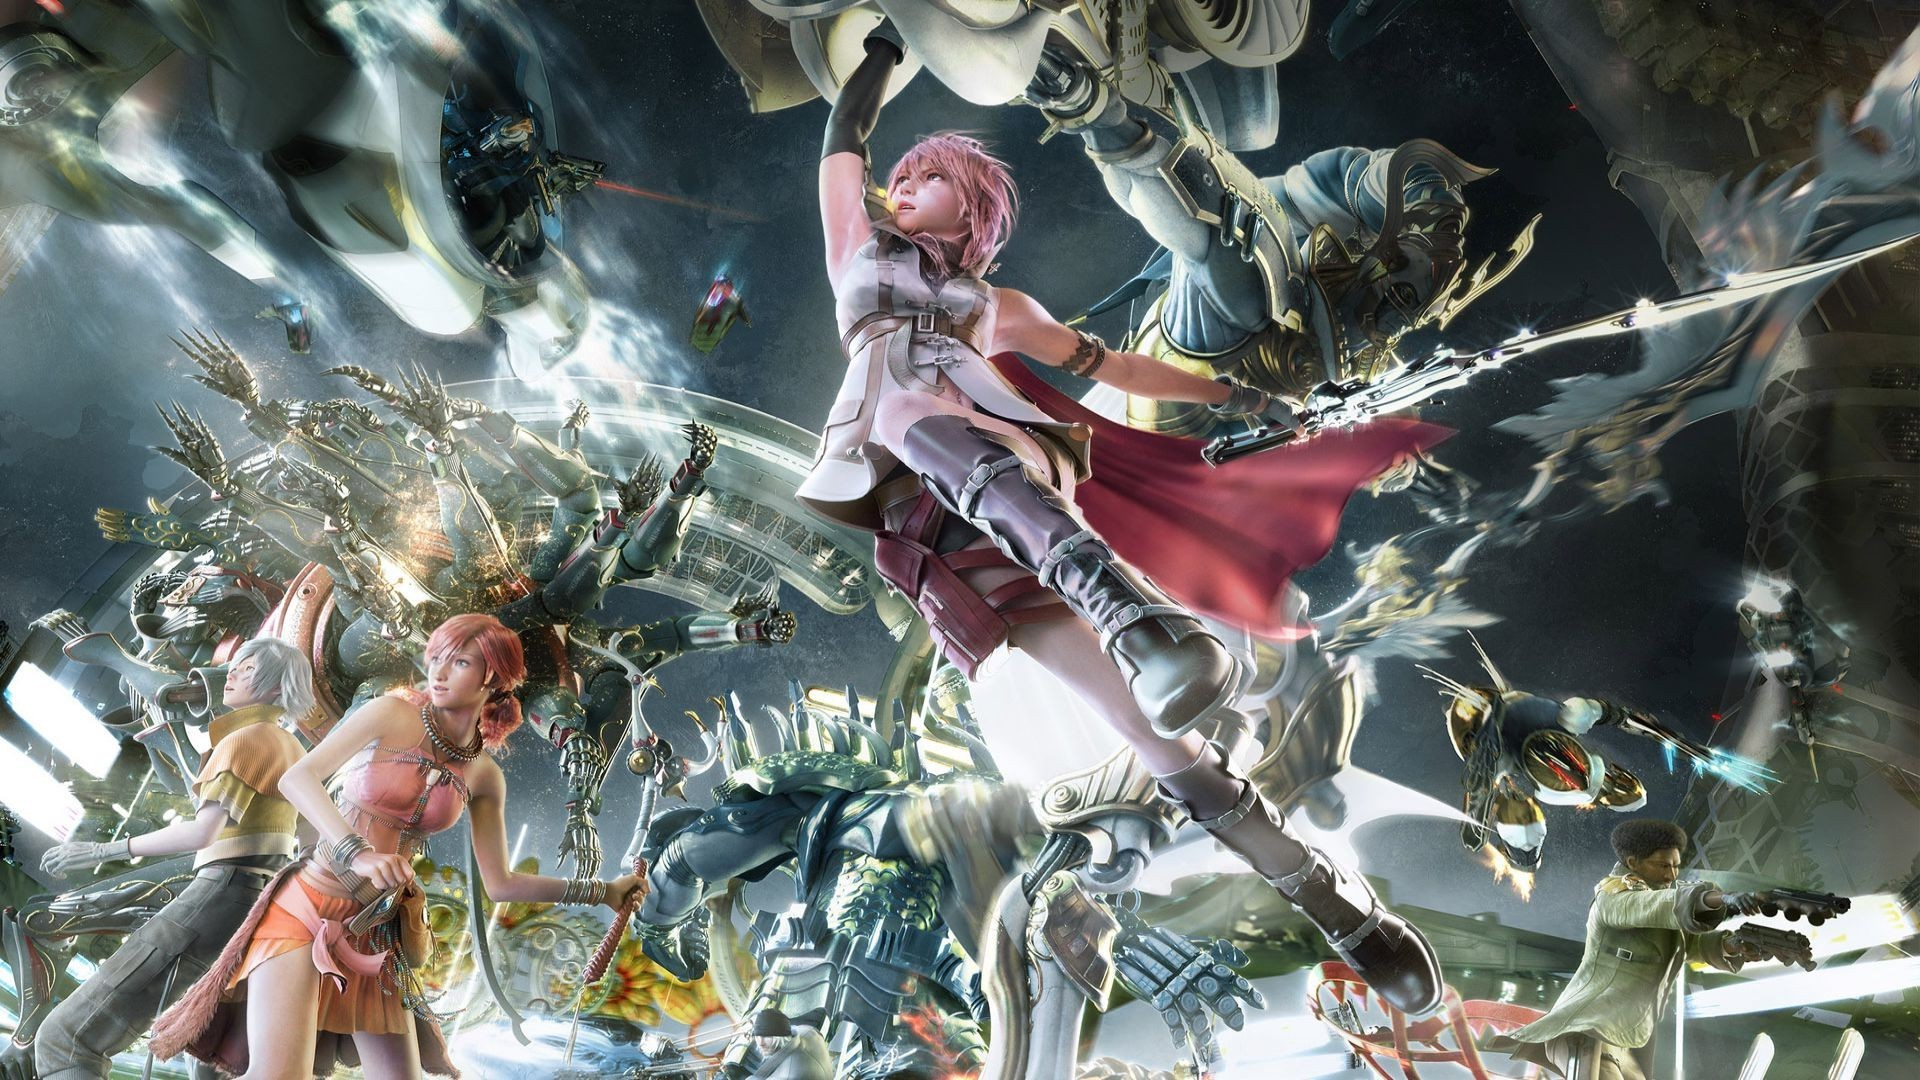 Final Fantasy 13 Hd Wallpaper Wallpapertag